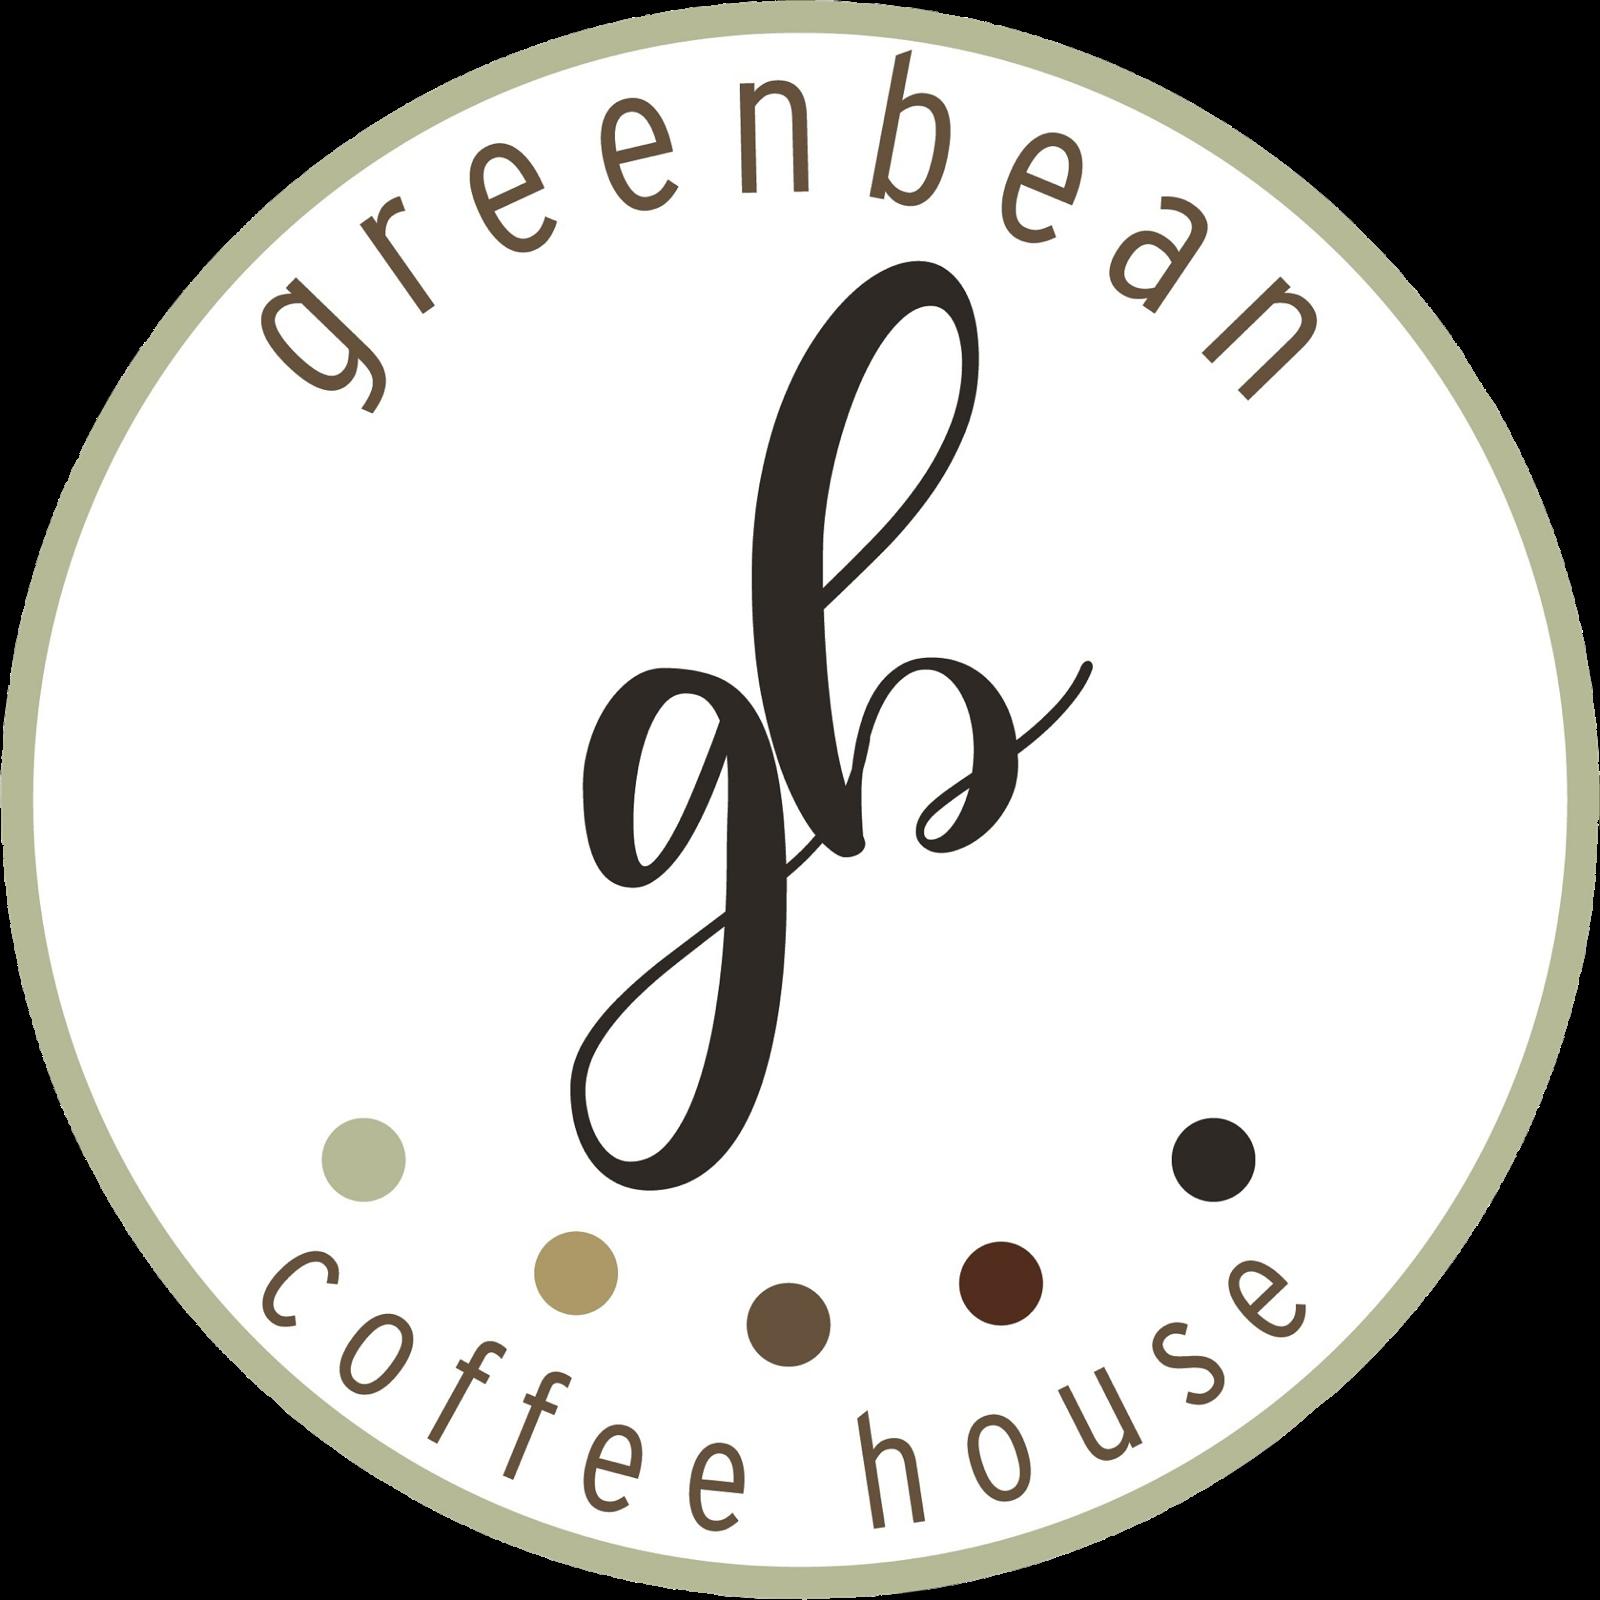 GreenBean Coffee HouseLogo